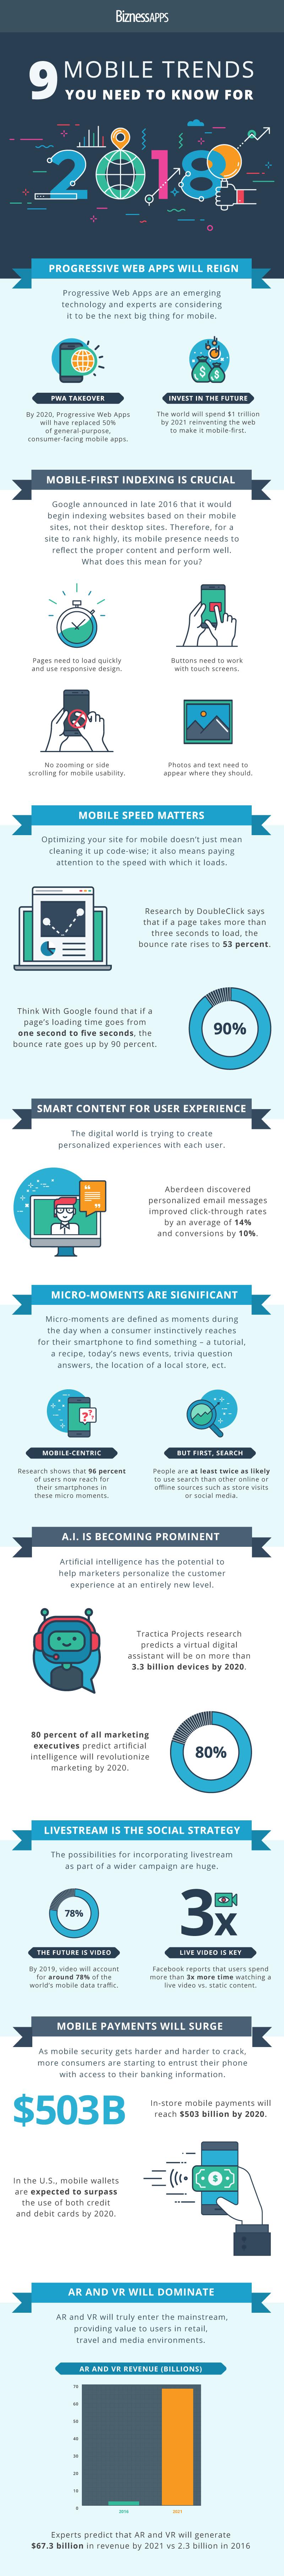 Mobile Marketing Tips For 2018